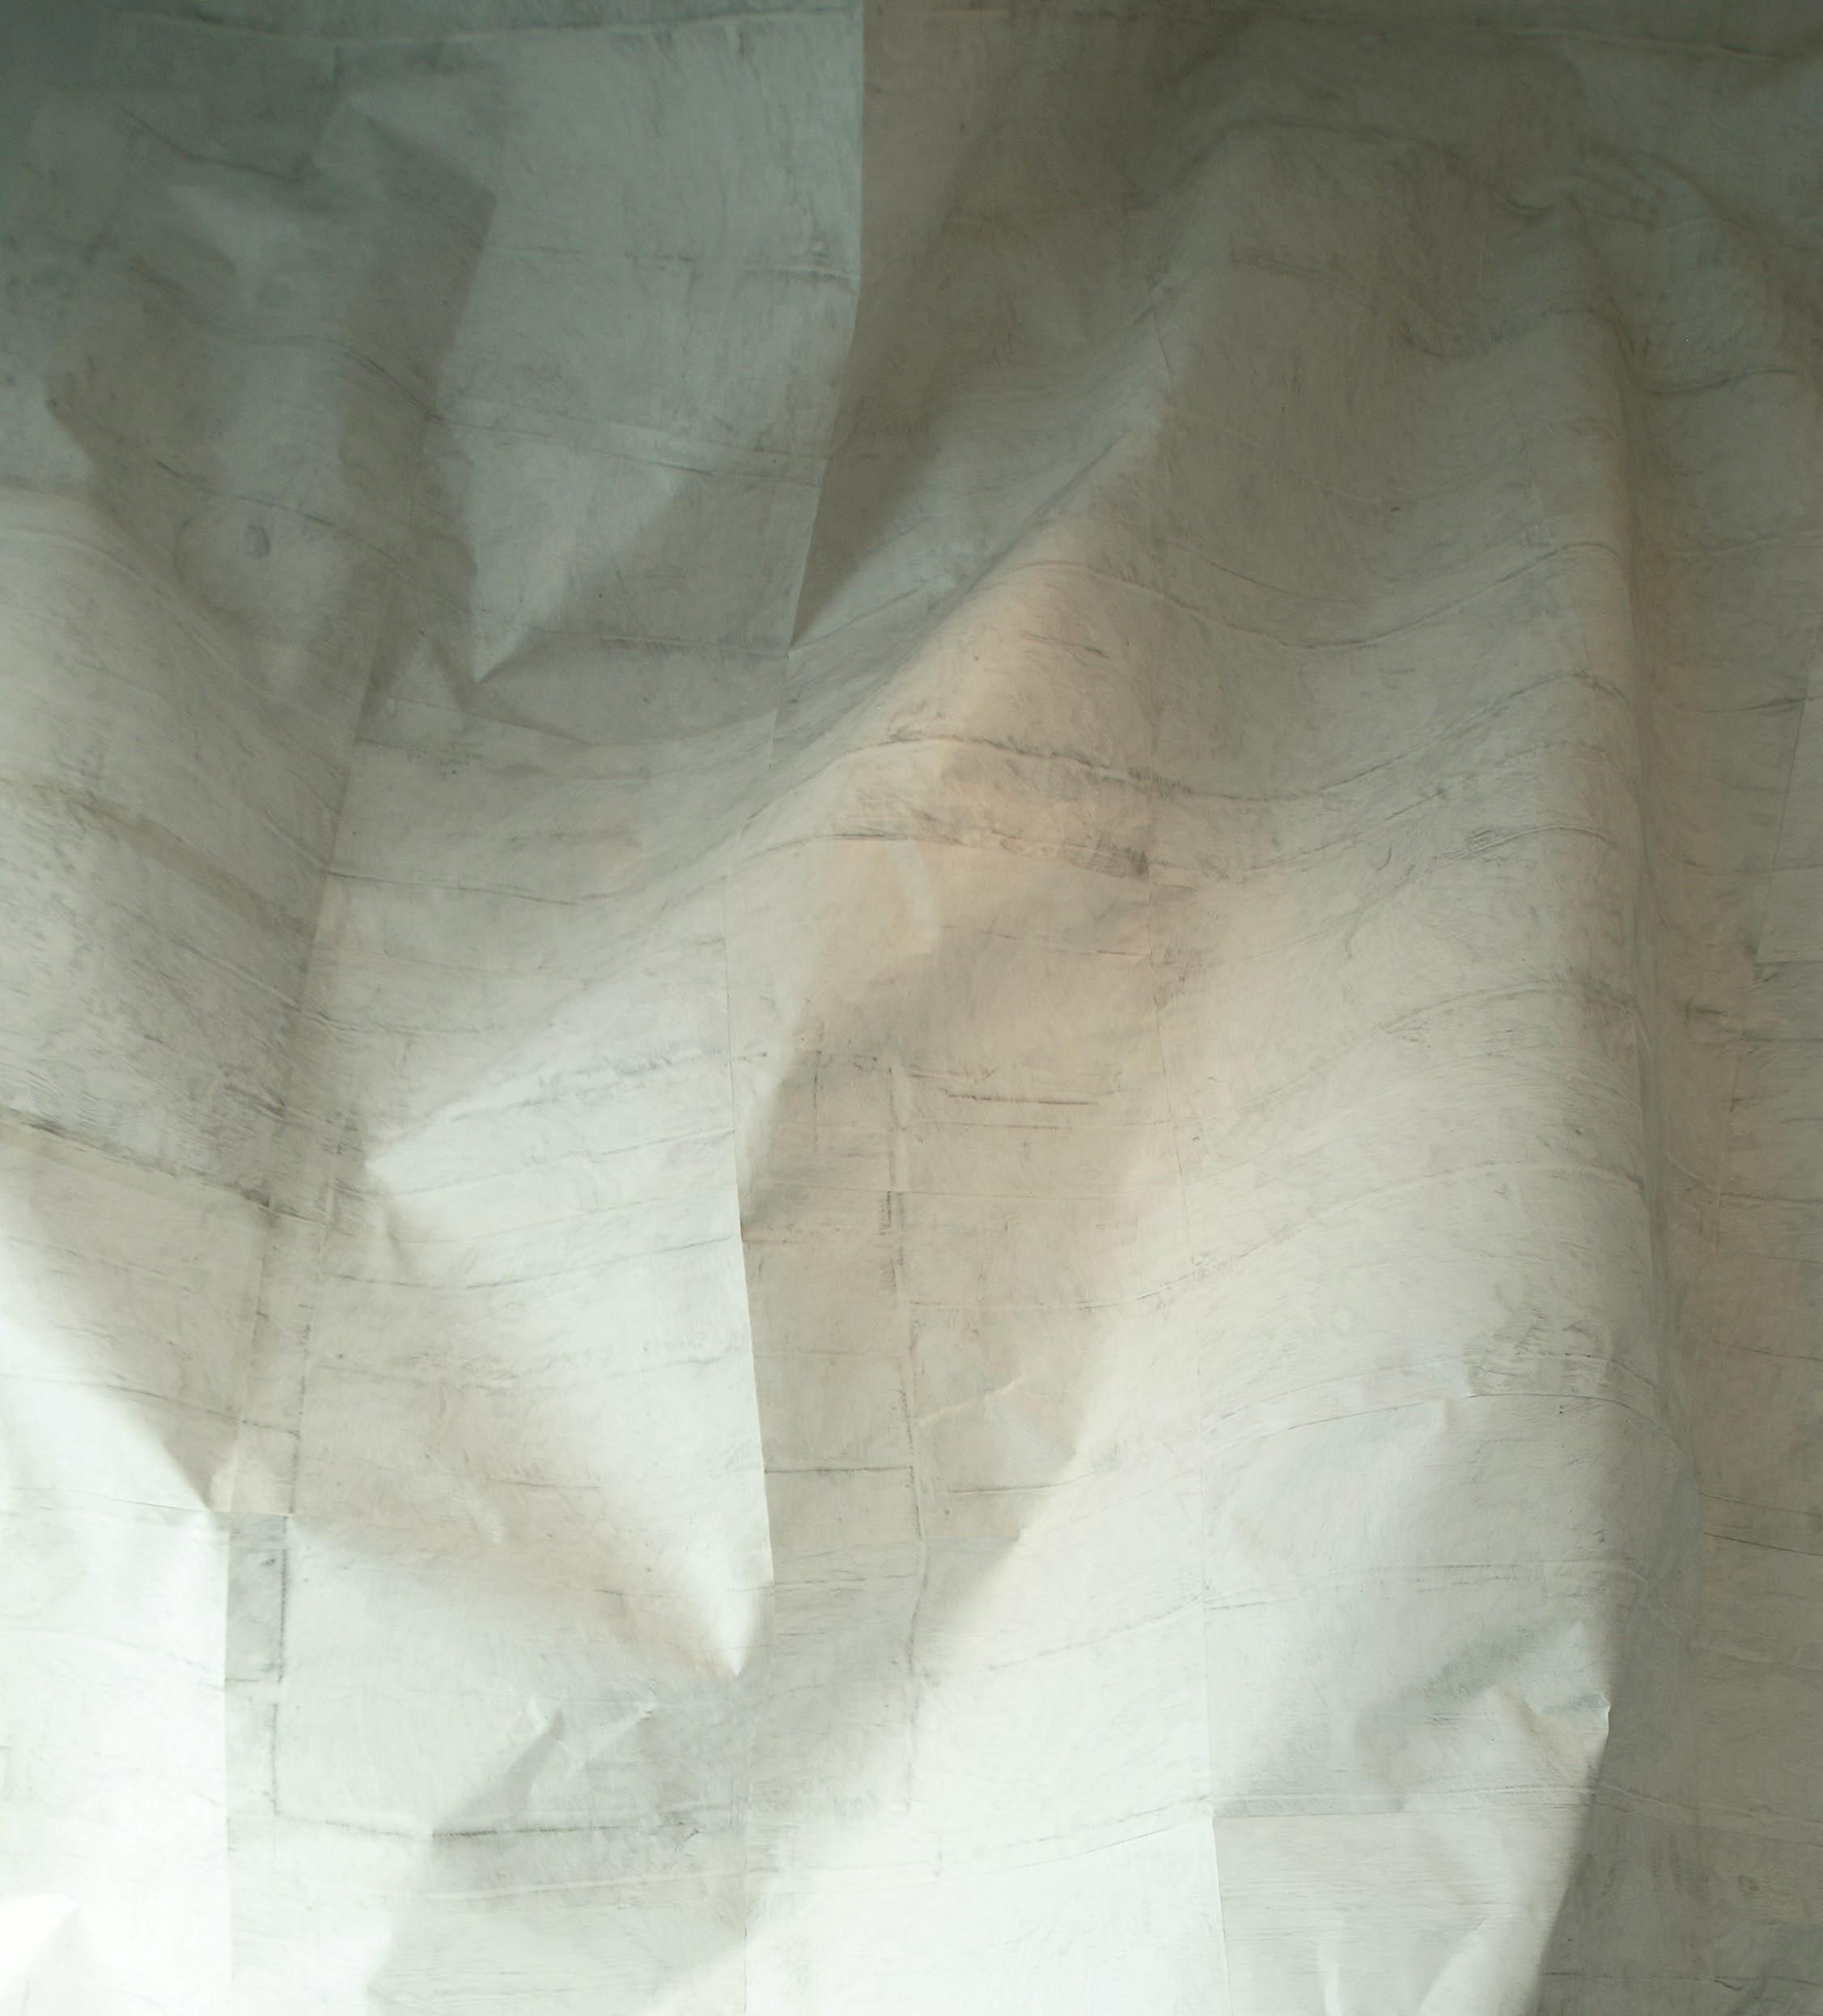 2012-11-21-DSC07617.jpg